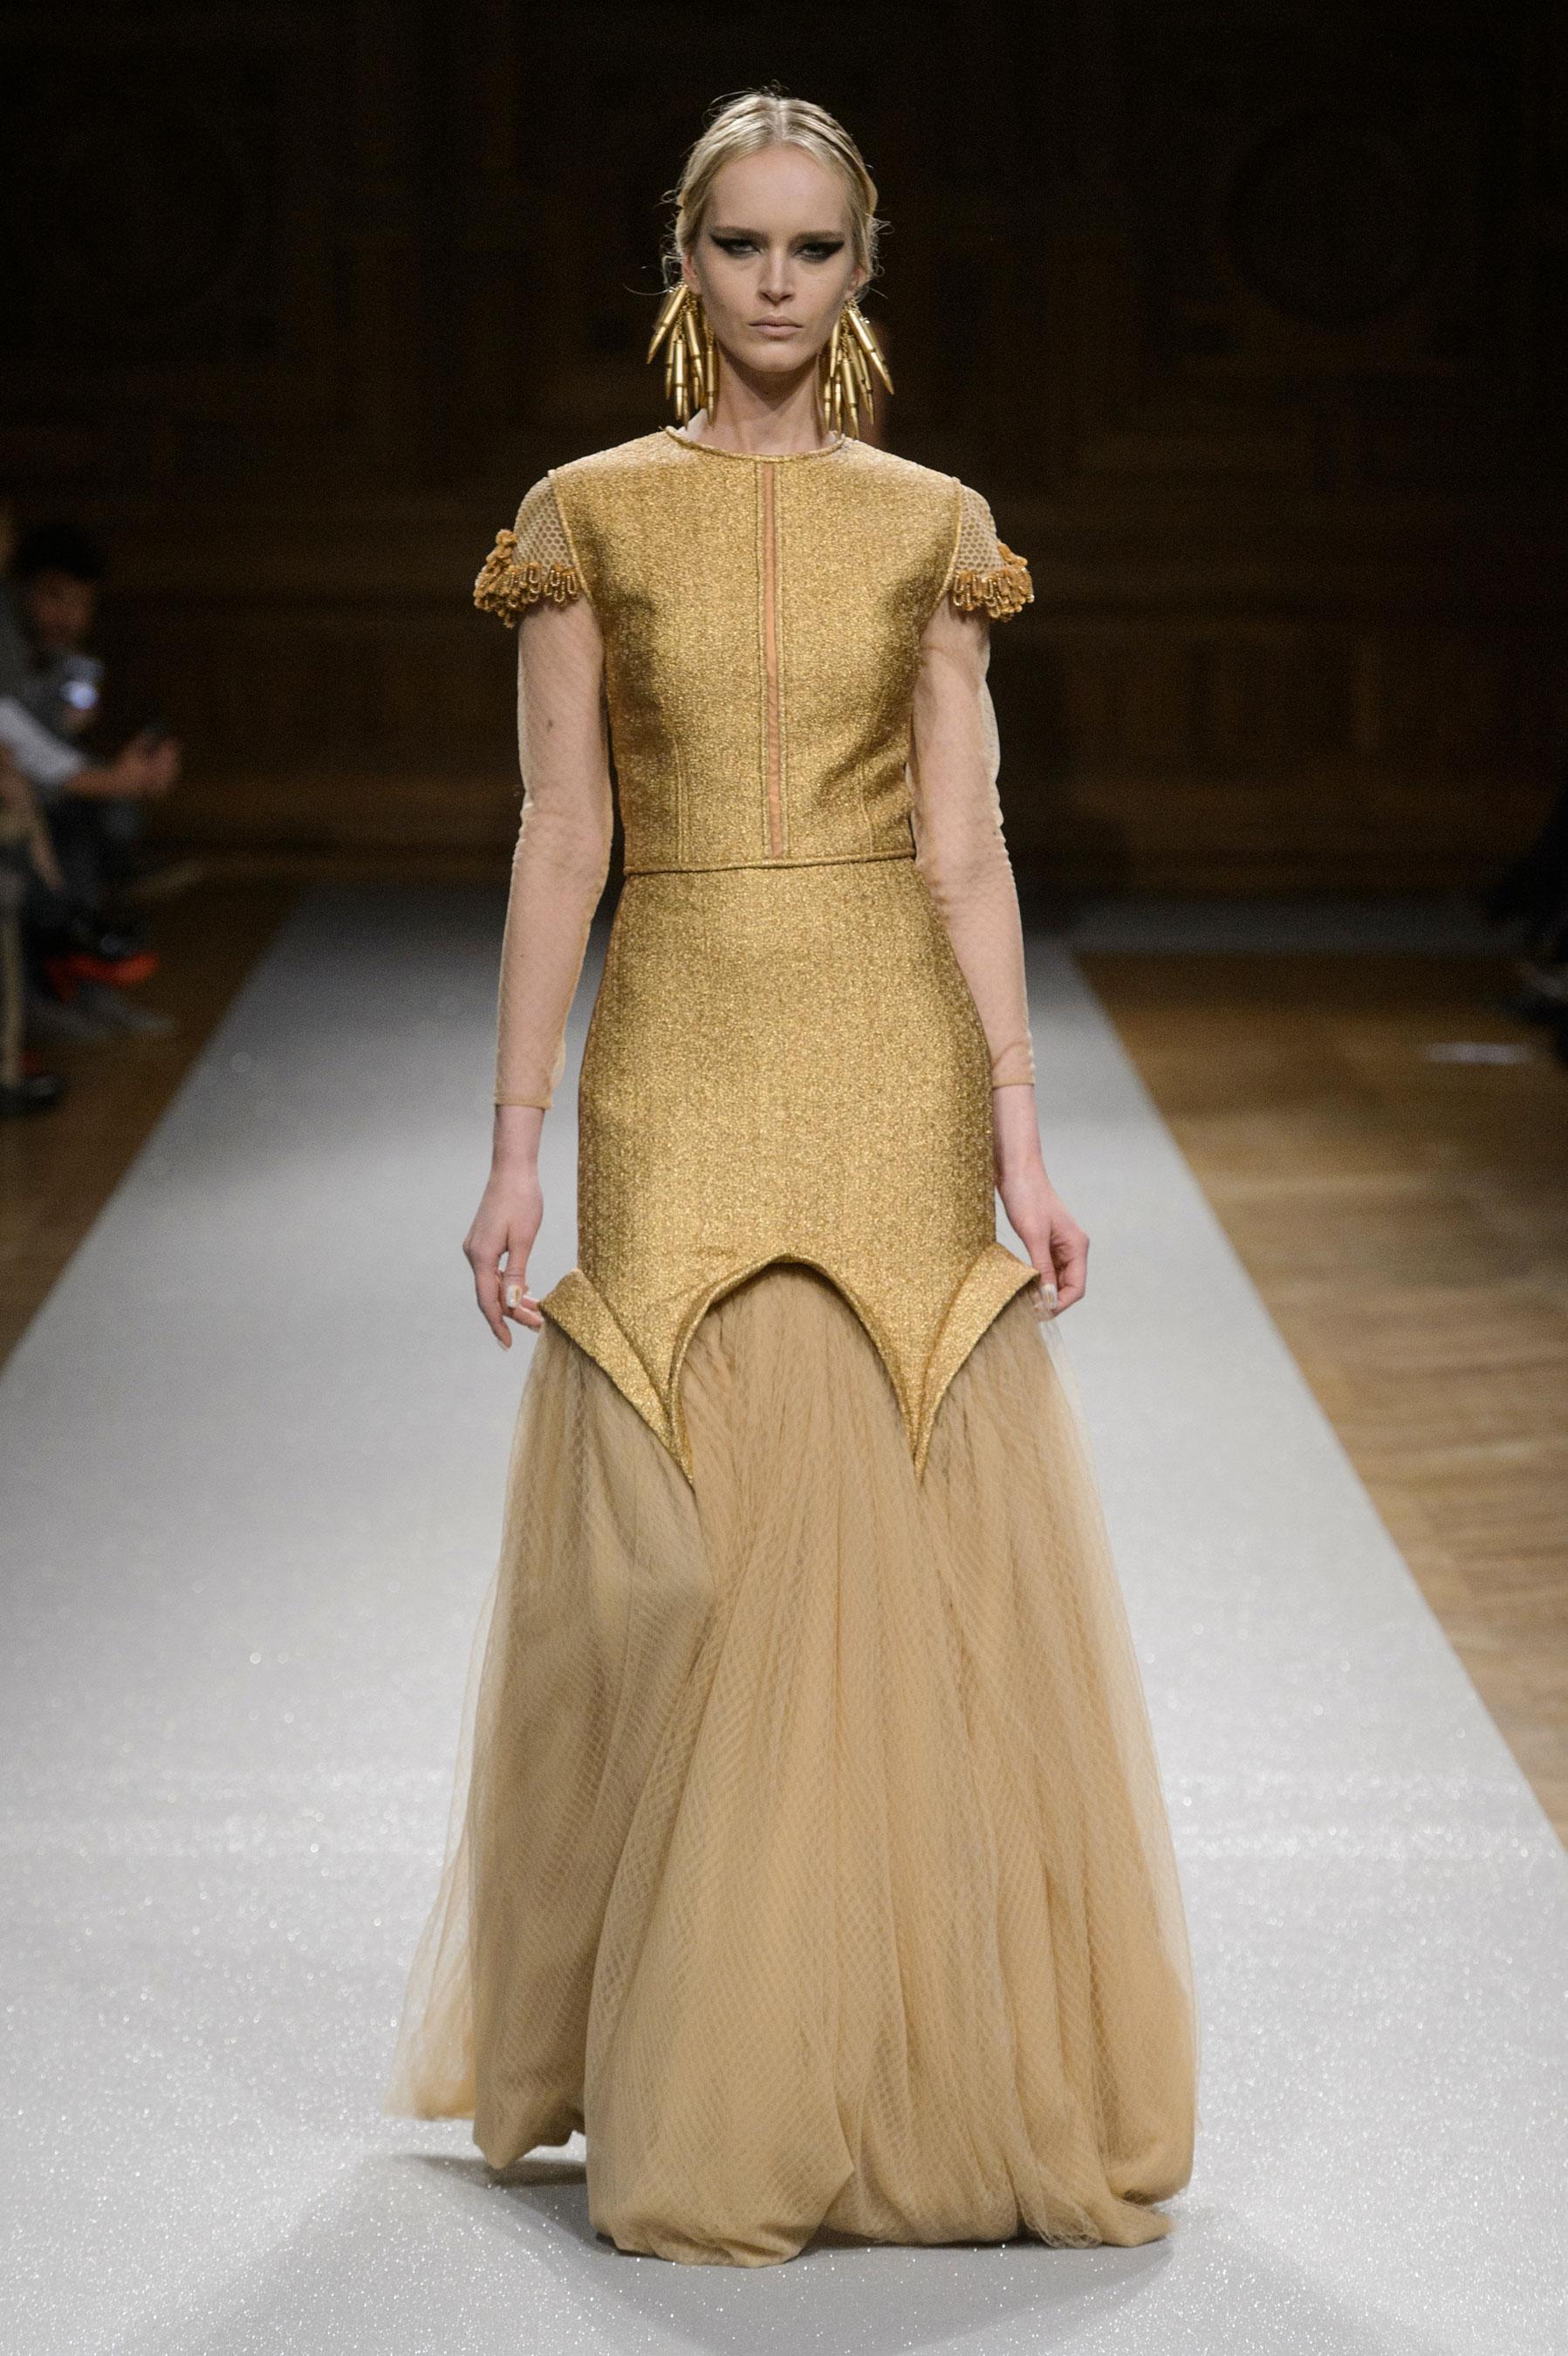 D fil oscar carvallo automne hiver 2014 2015 couture for 1900 haute couture